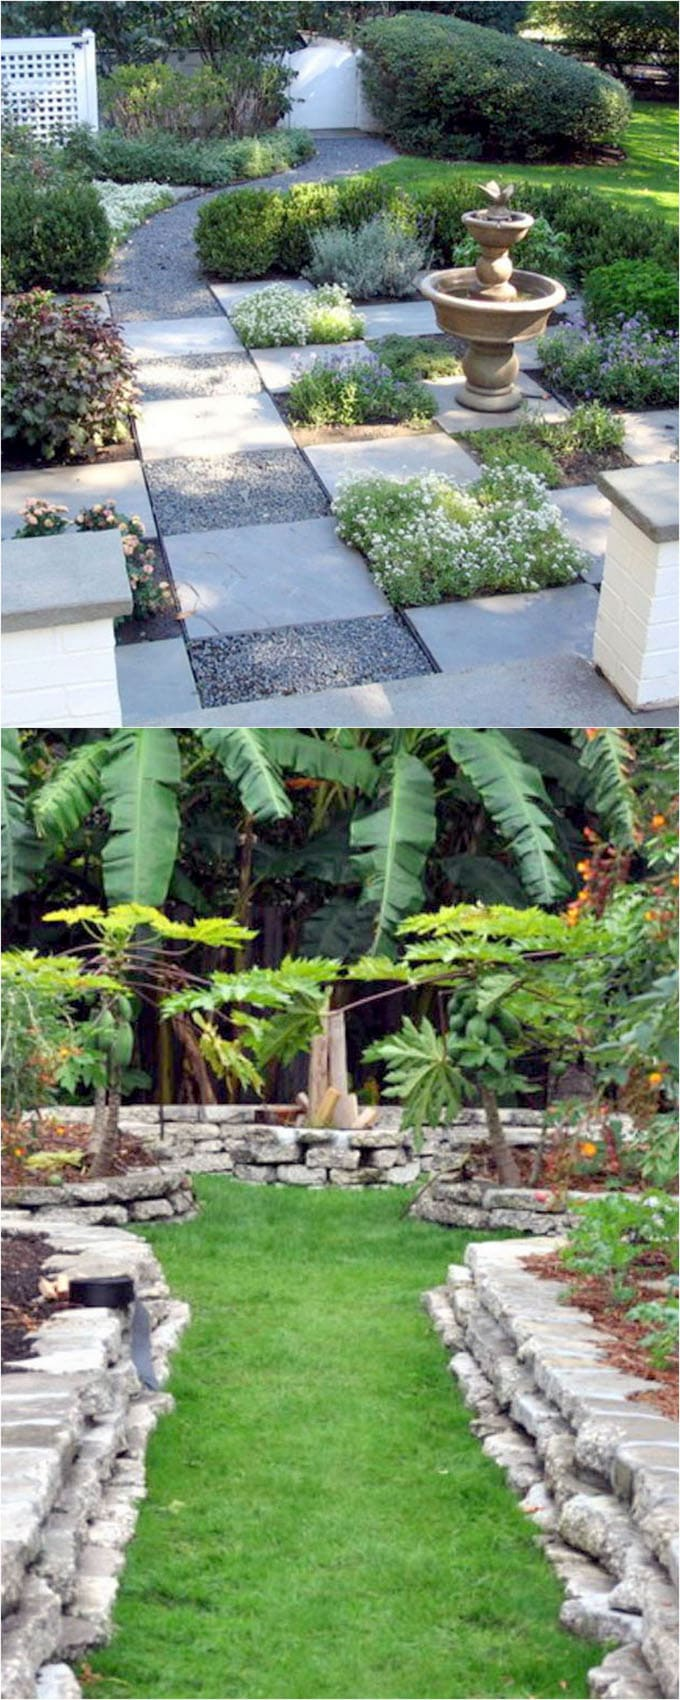 25 Most Beautiful DIY Garden Path Ideas - A Piece Of Rainbow on Patio And Path Ideas  id=12212